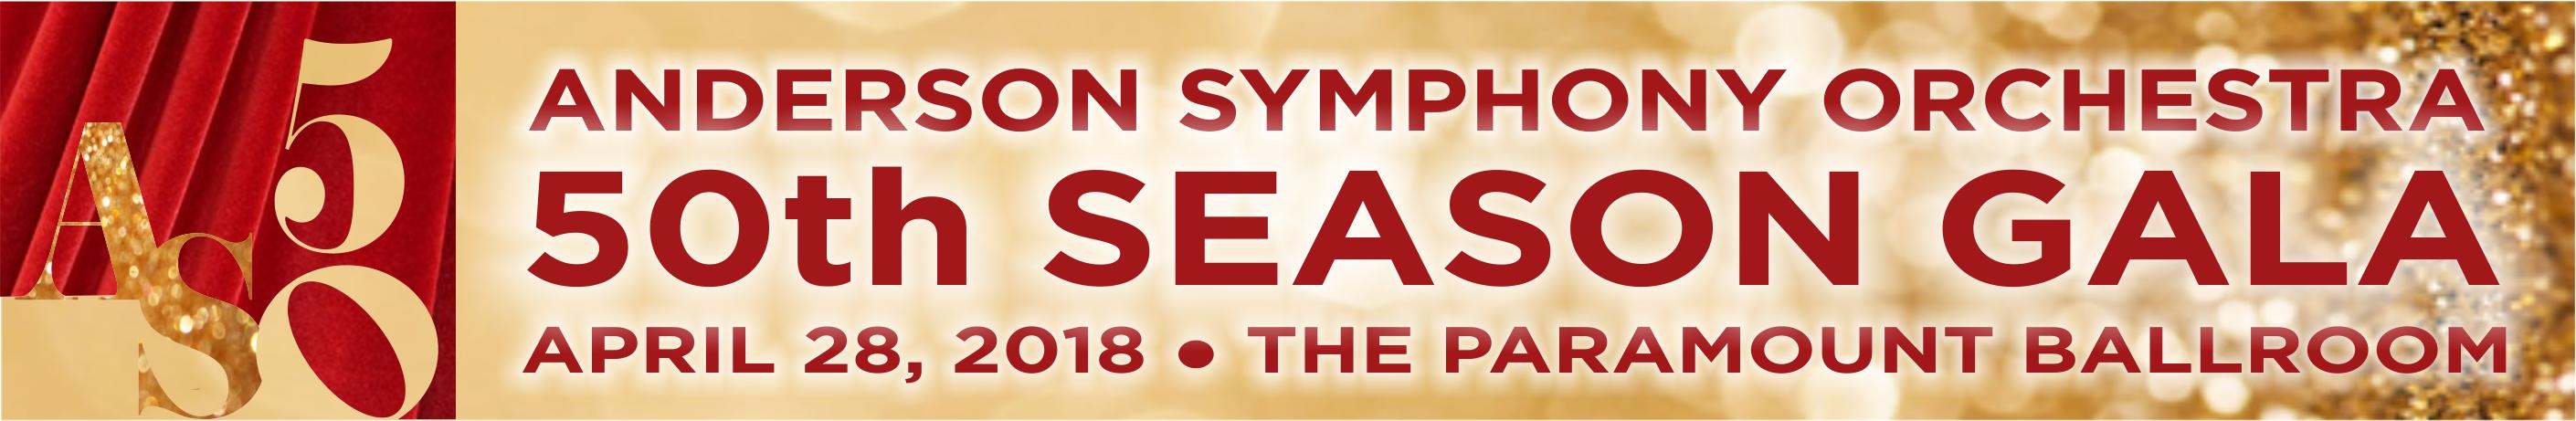 ASO Gala 50th Season Legacy